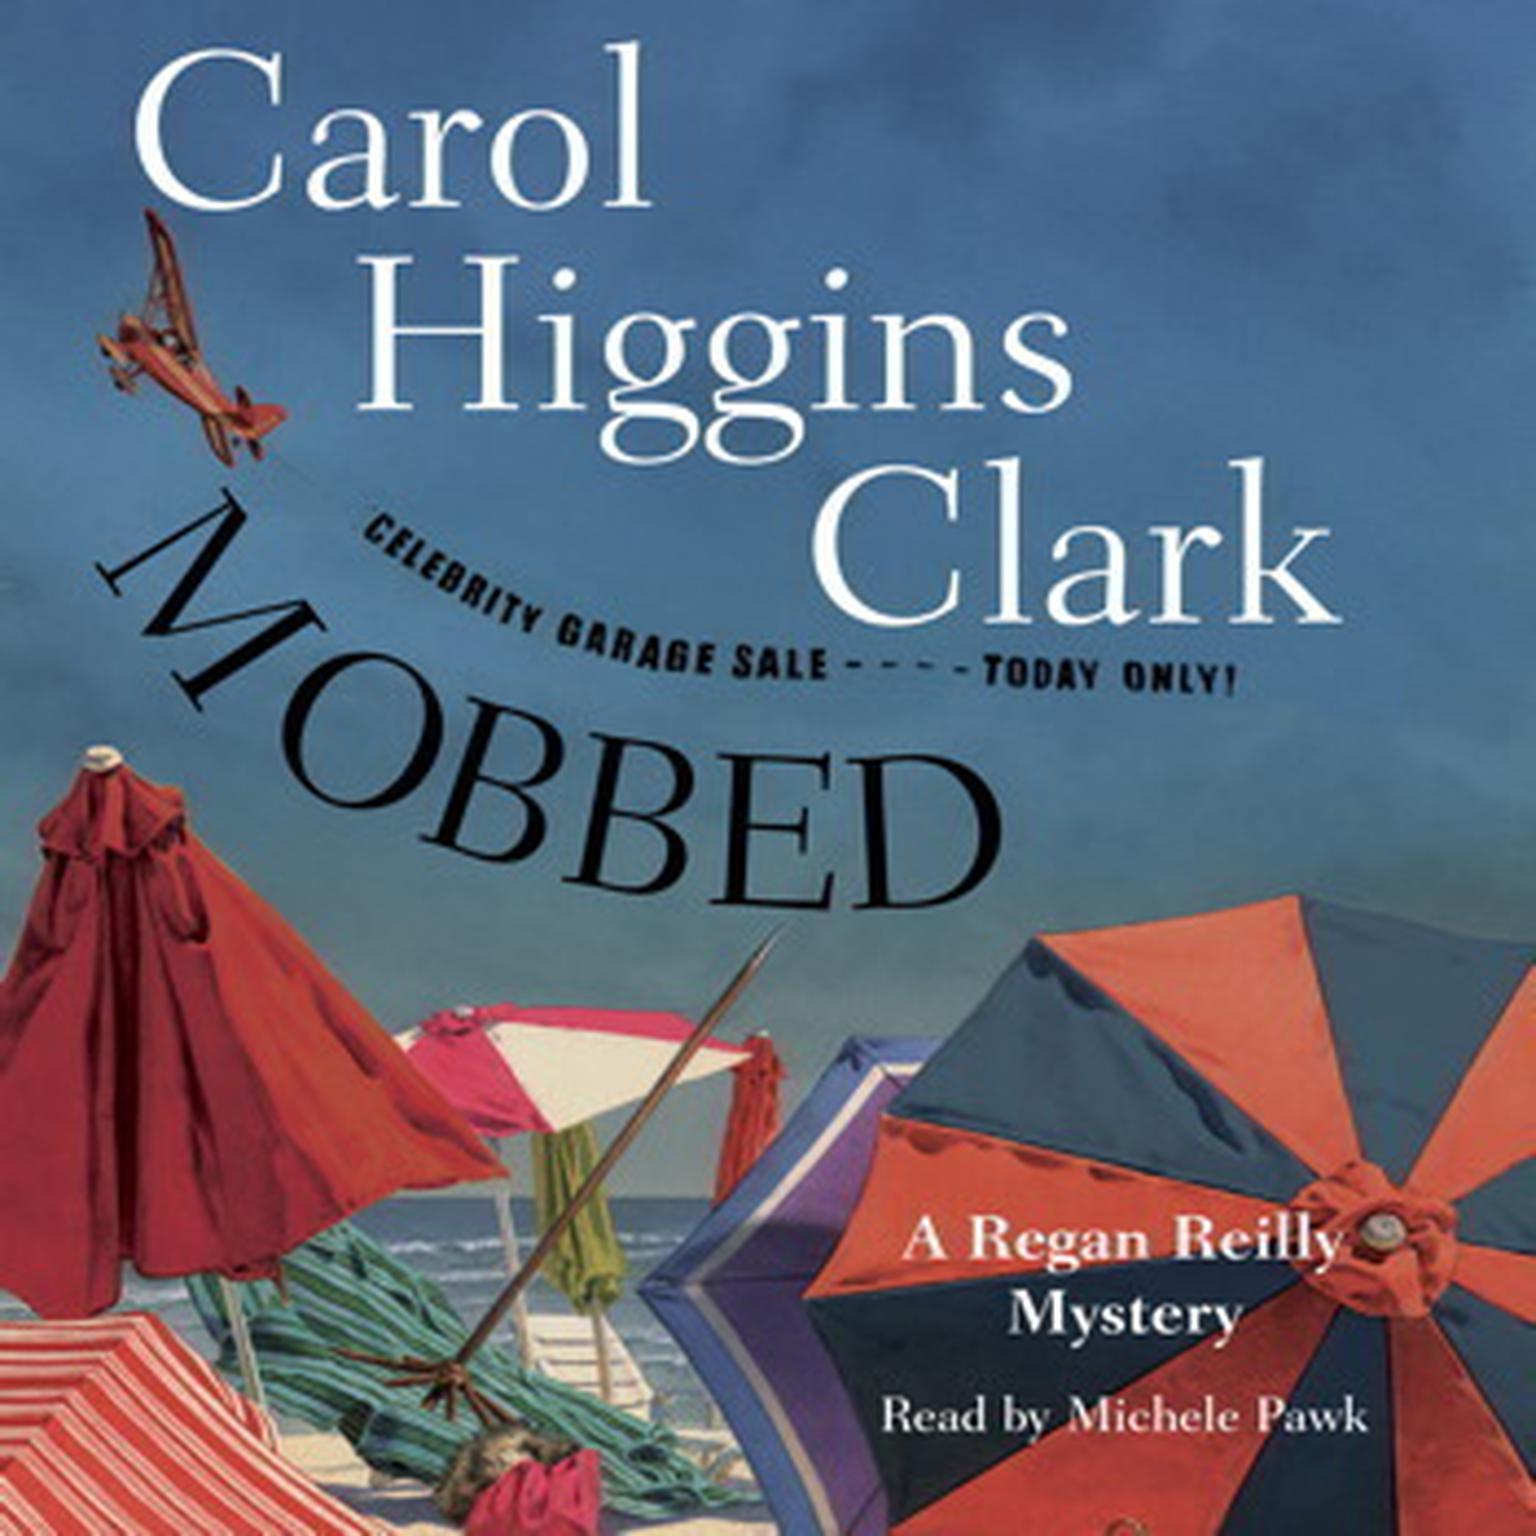 Mobbed: A Regan Reilly Mystery Audiobook, by Carol Higgins Clark